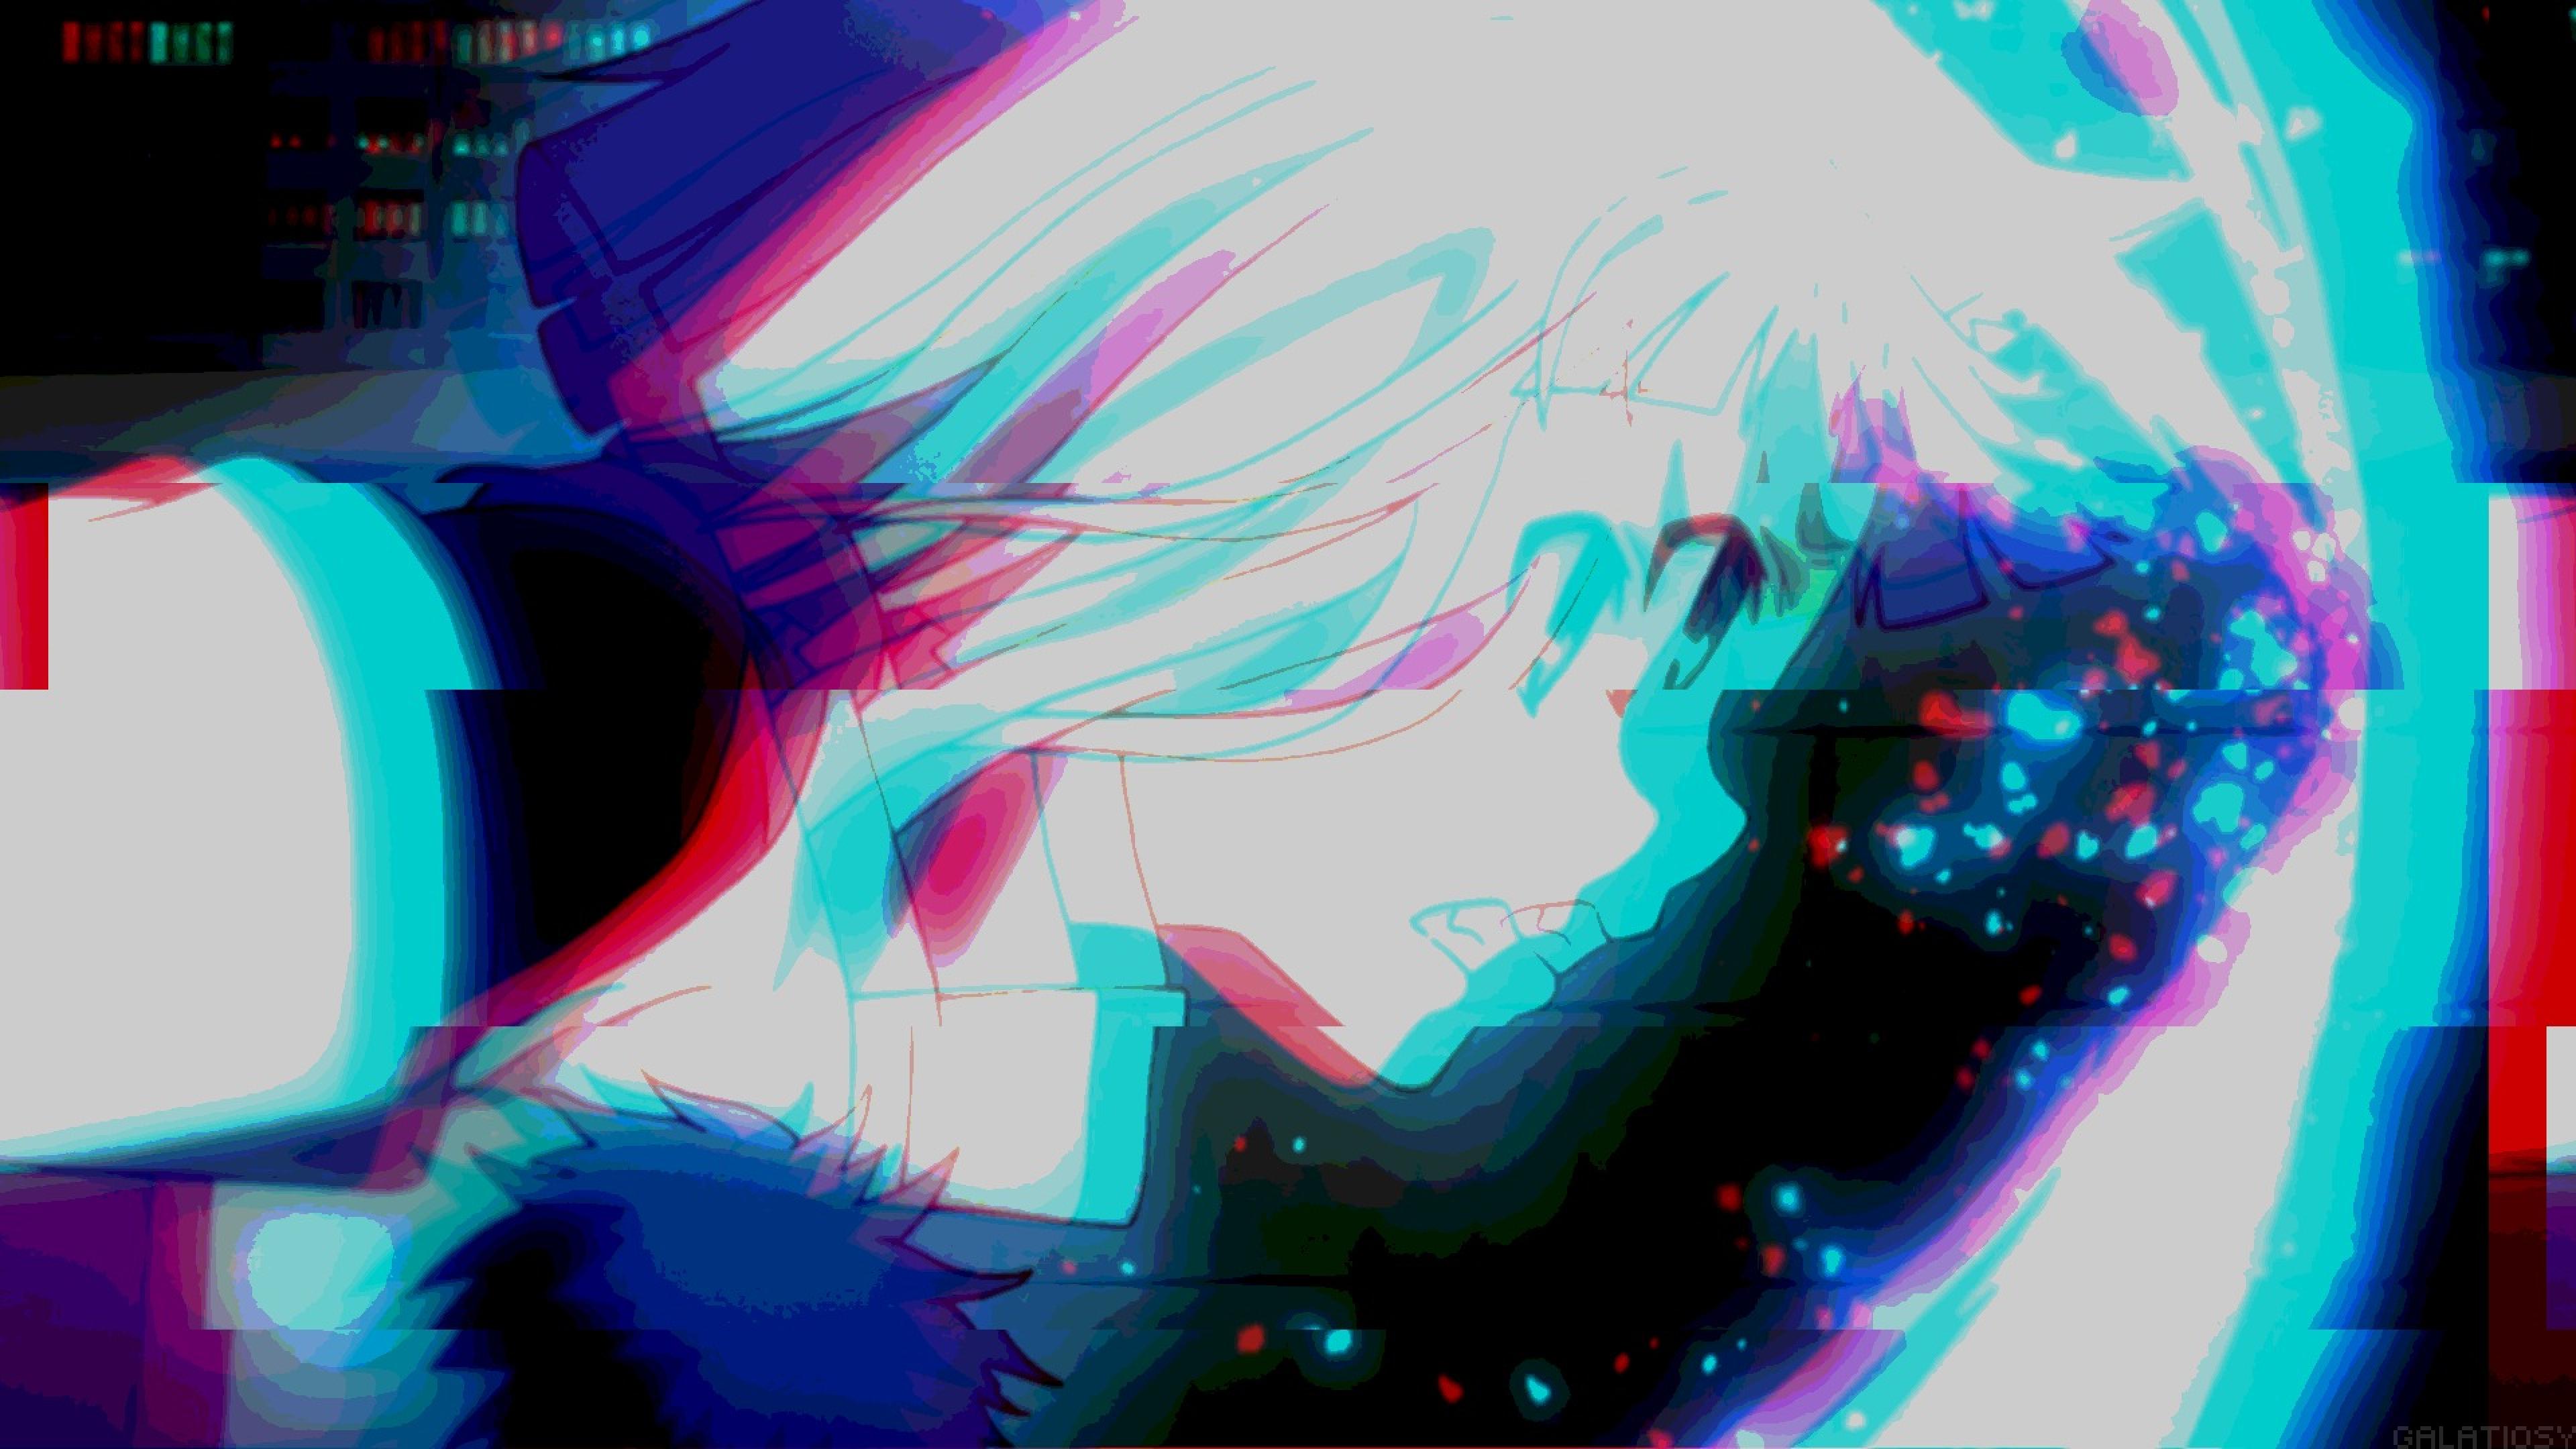 Anime Girl Aesthetic Glitch 4k Ultra Hd Wallpaper Anime Aesthetic Wallpaper Desktop 3840x2160 Wallpaper Teahub Io